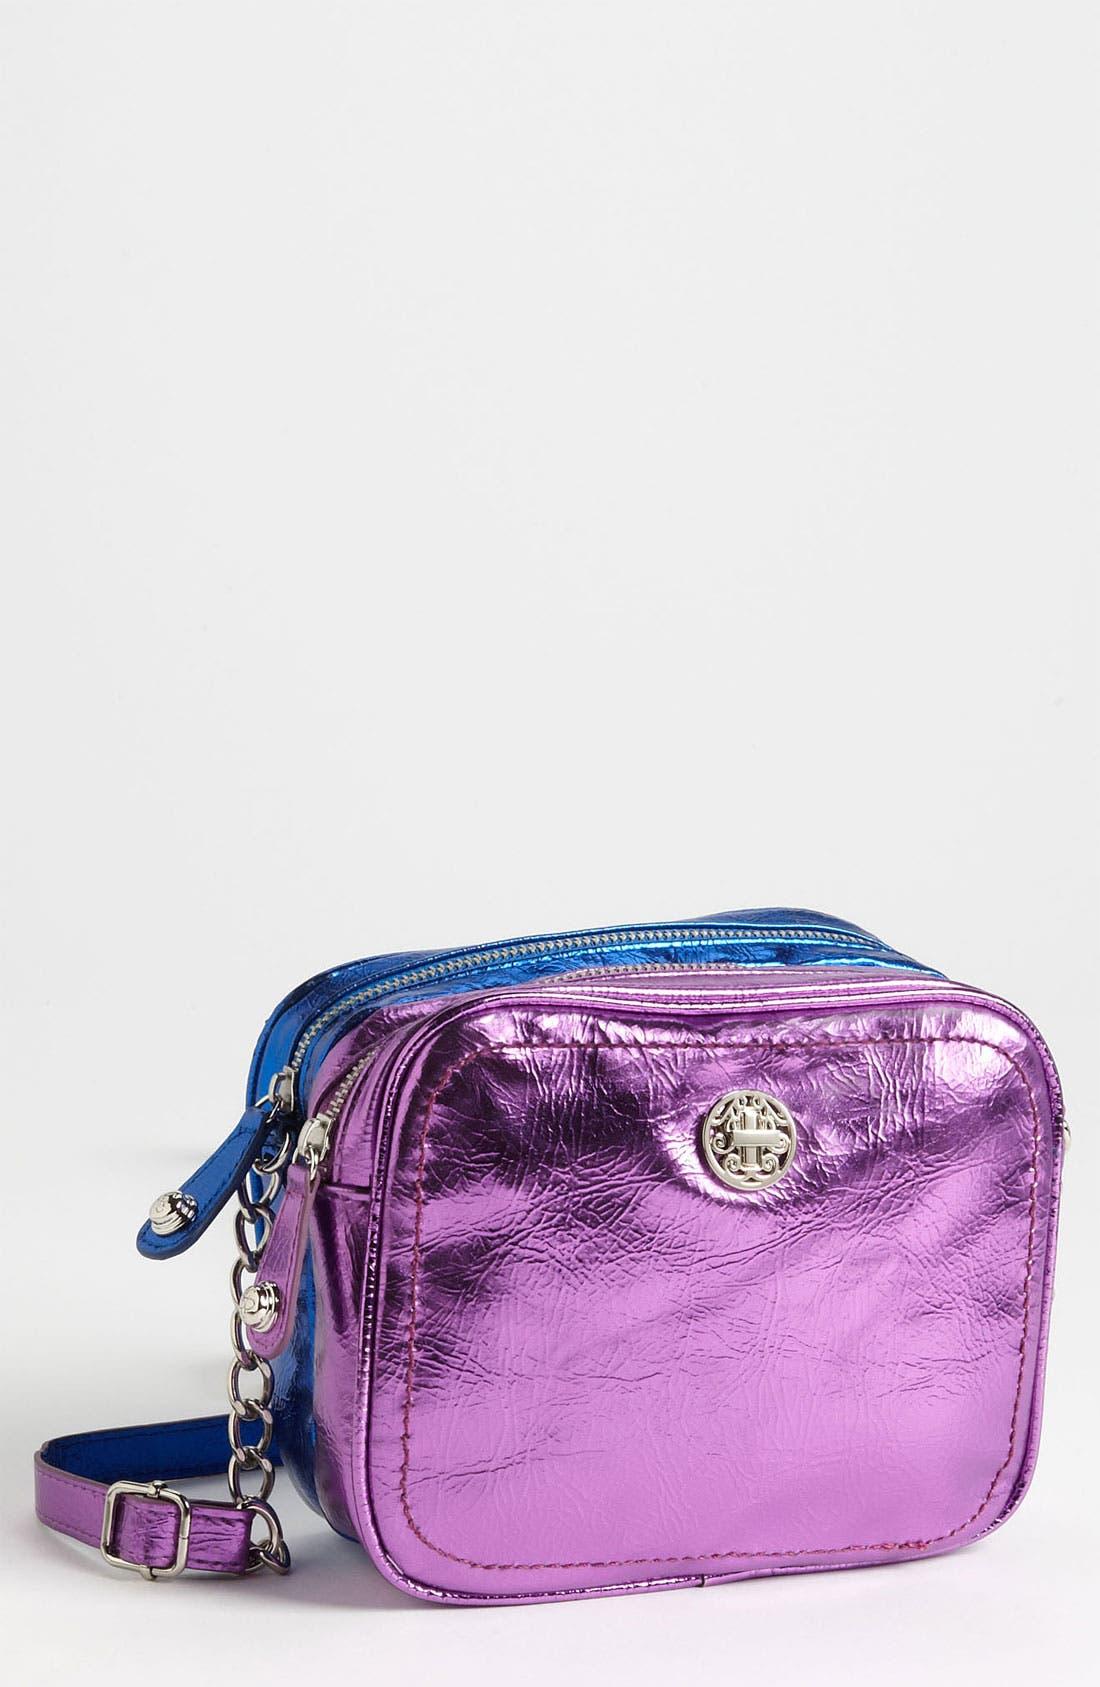 Main Image - Jessica Simpson 'Double Take' Crossbody Bag